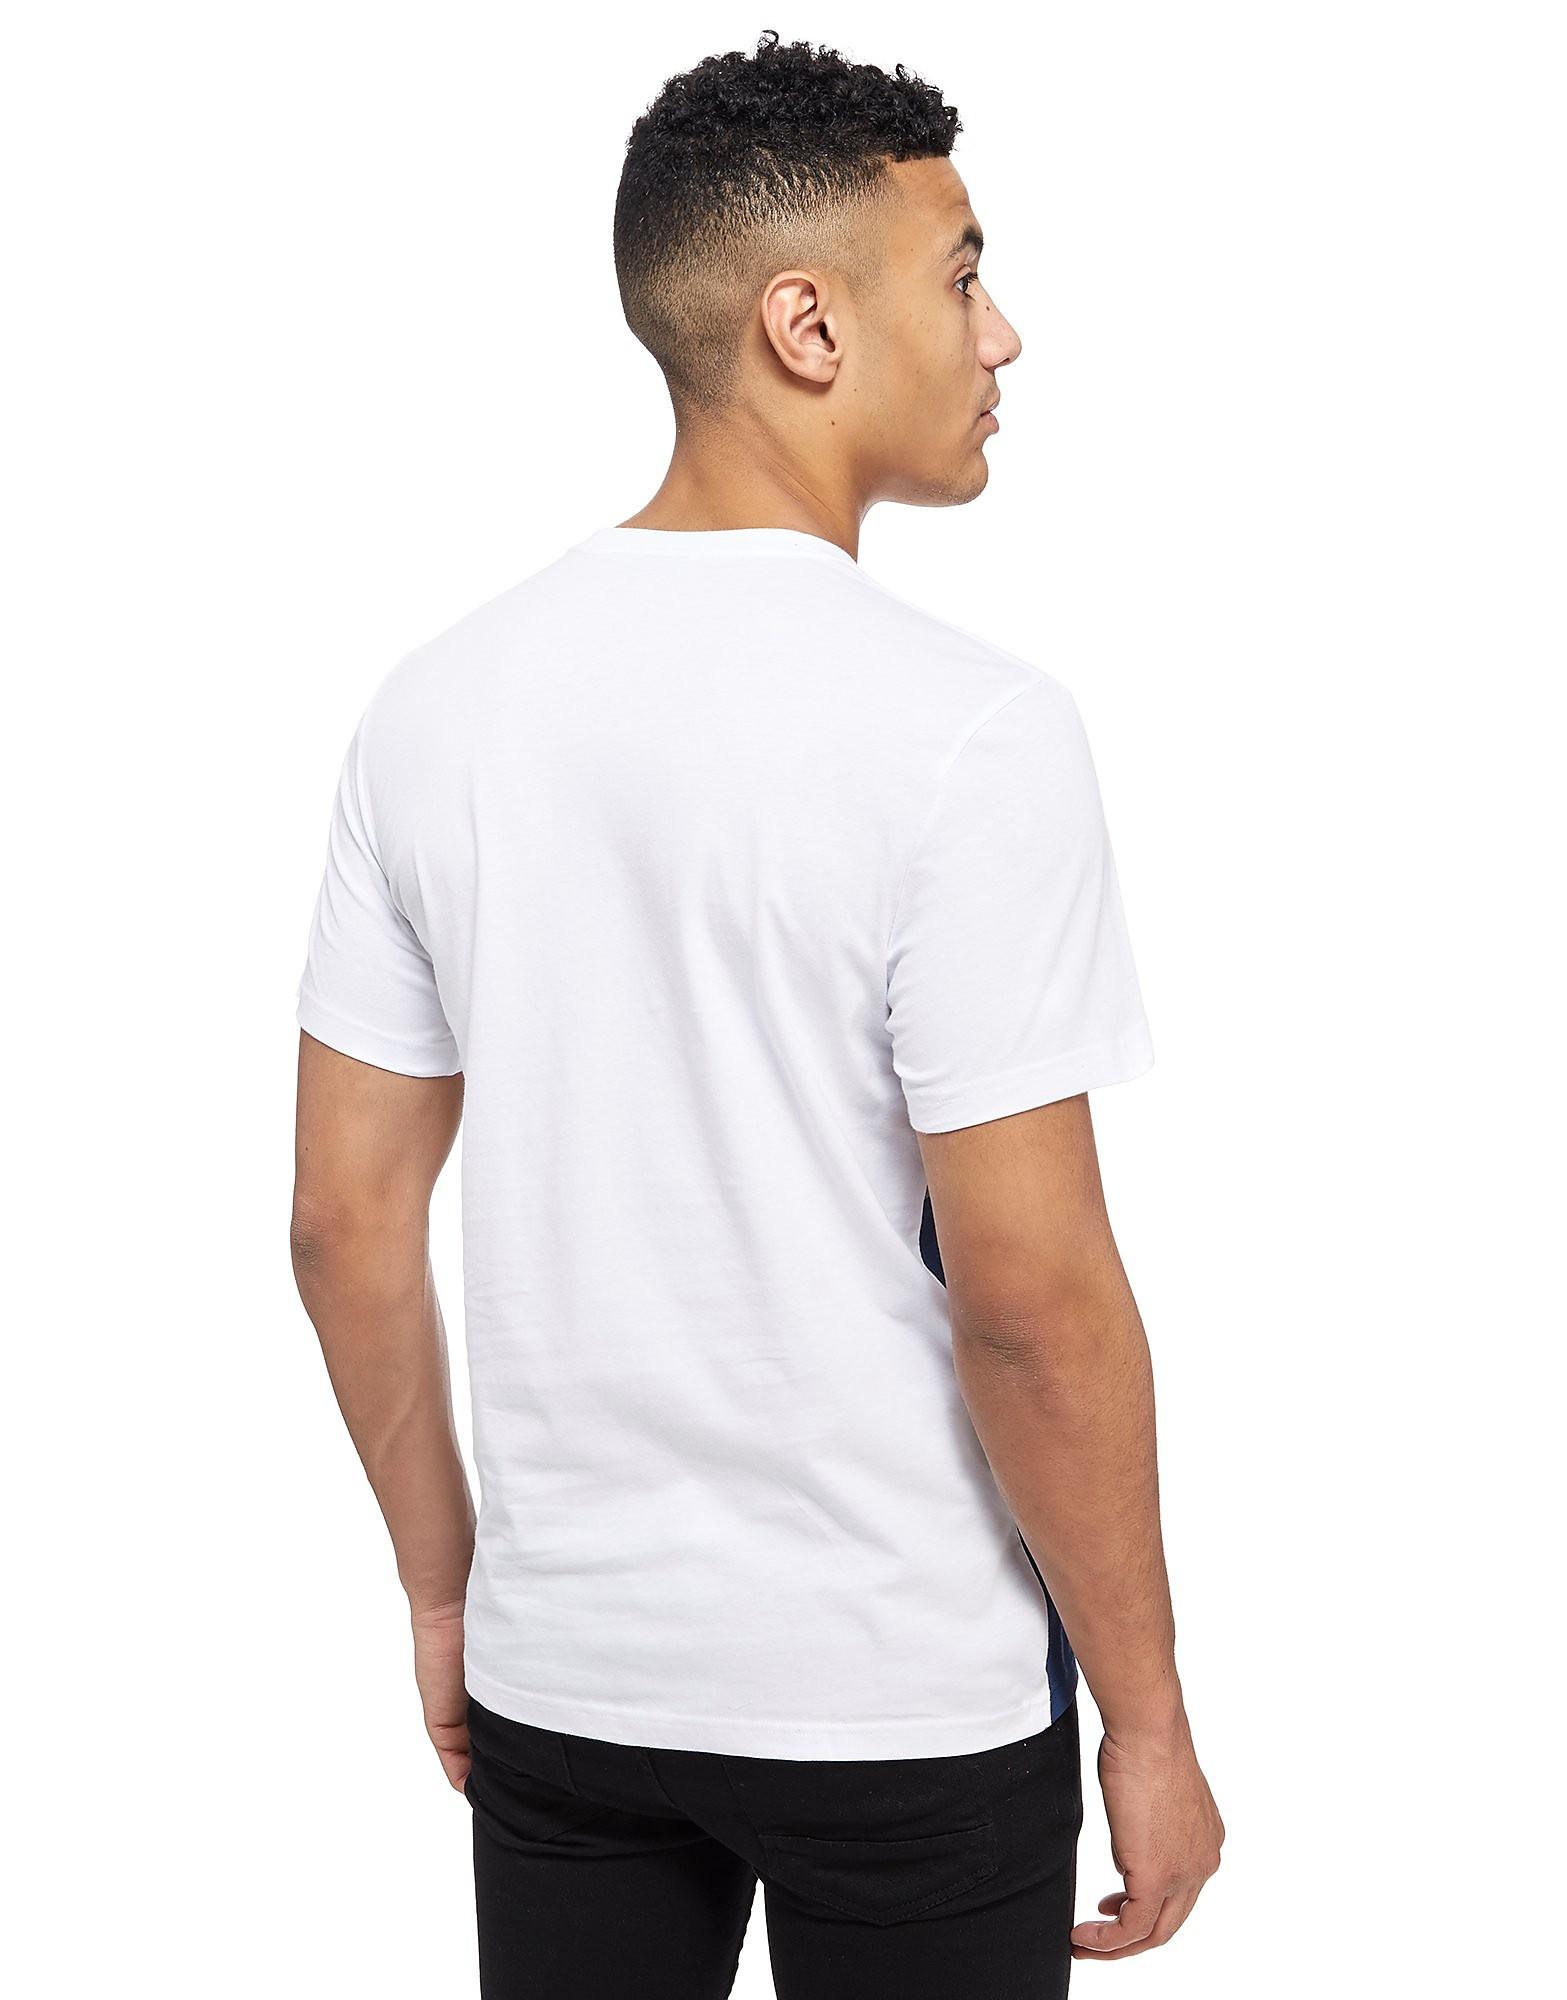 adidas Originals Trefoil Colour Block T-Shirt